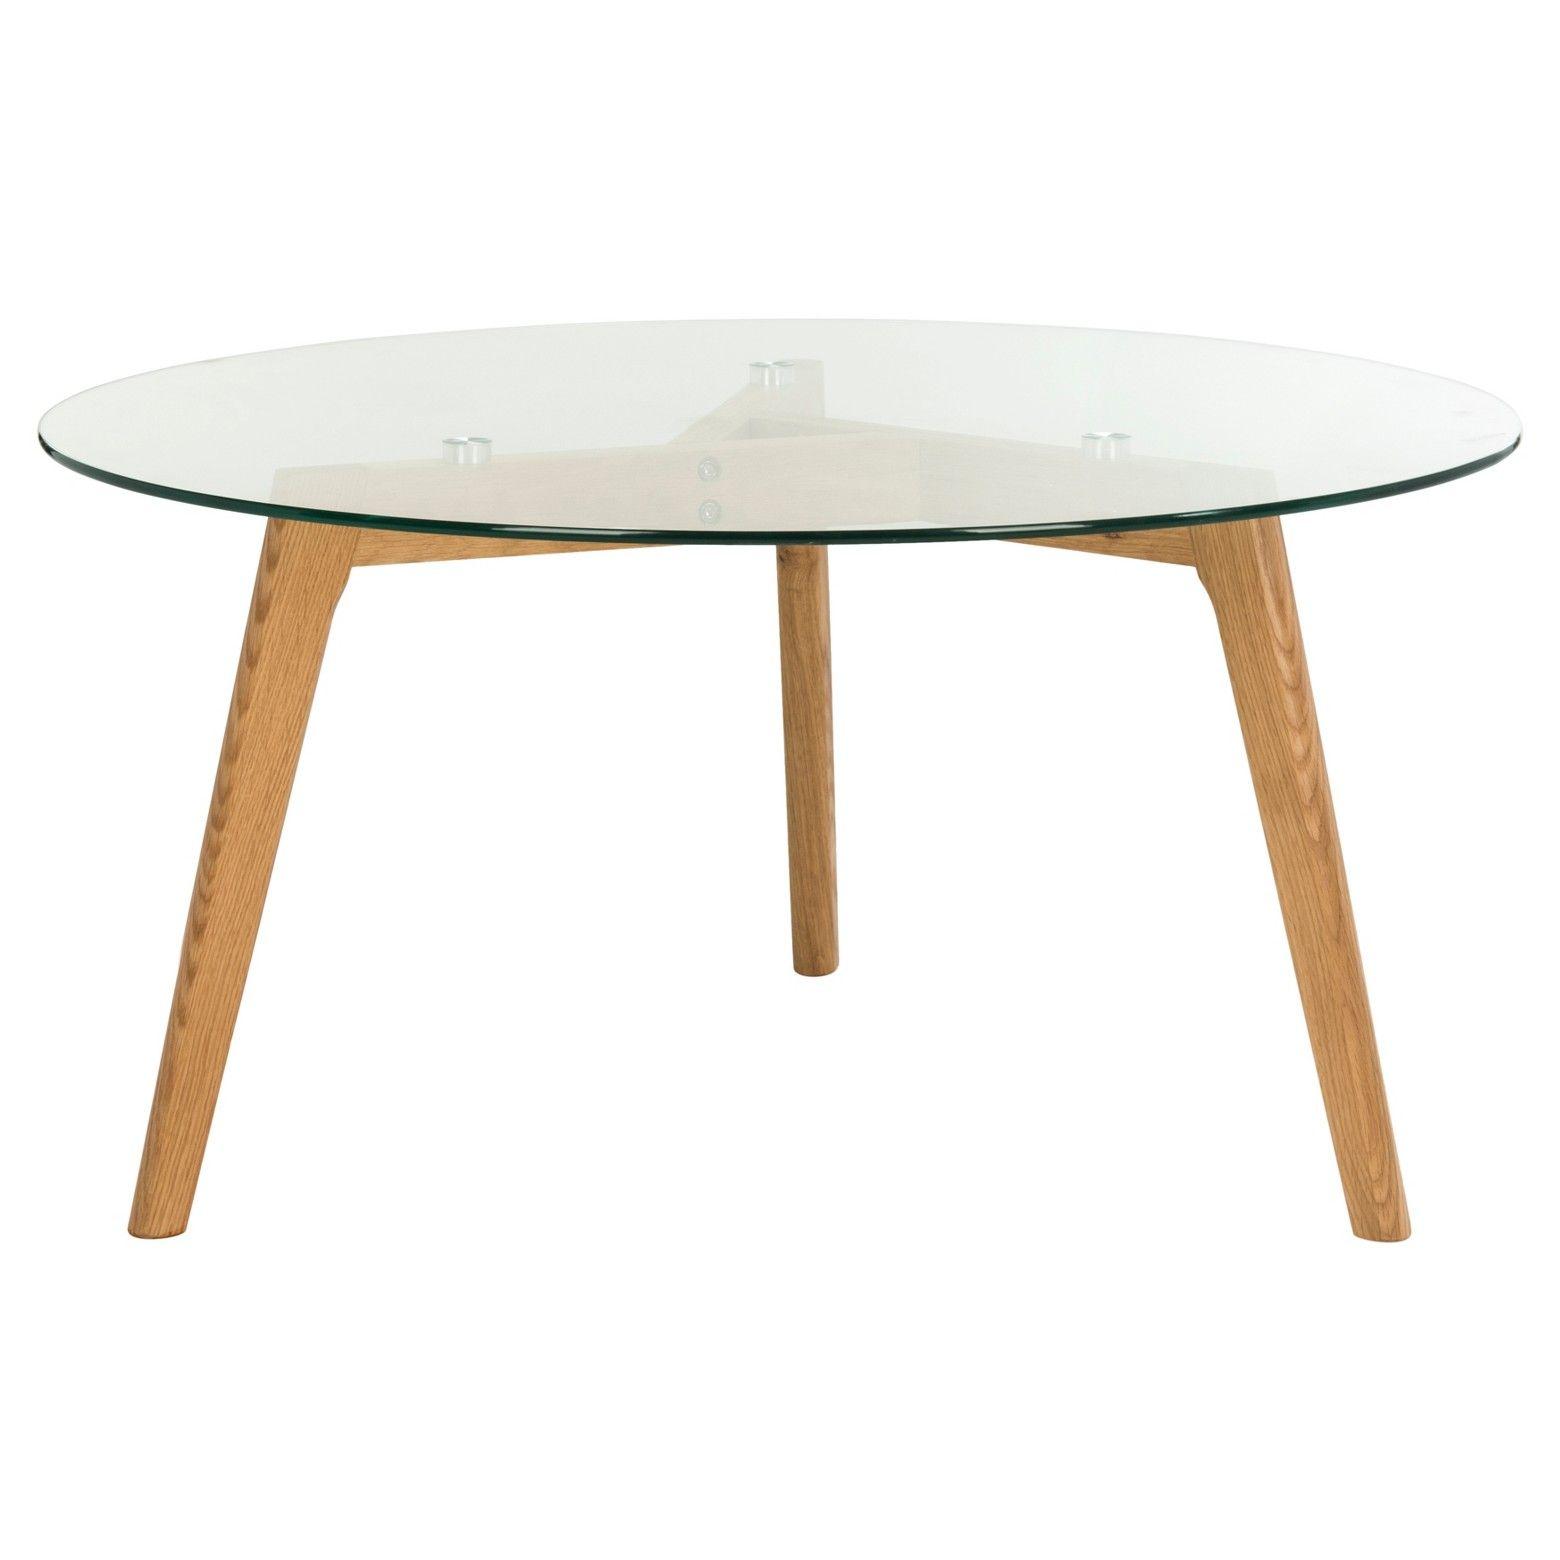 Marjoram Round Glass Coffee Table Clear Oak Safavieh Coffee Table Round Glass Coffee Table Contemporary Glass Coffee Tables [ 1560 x 1560 Pixel ]